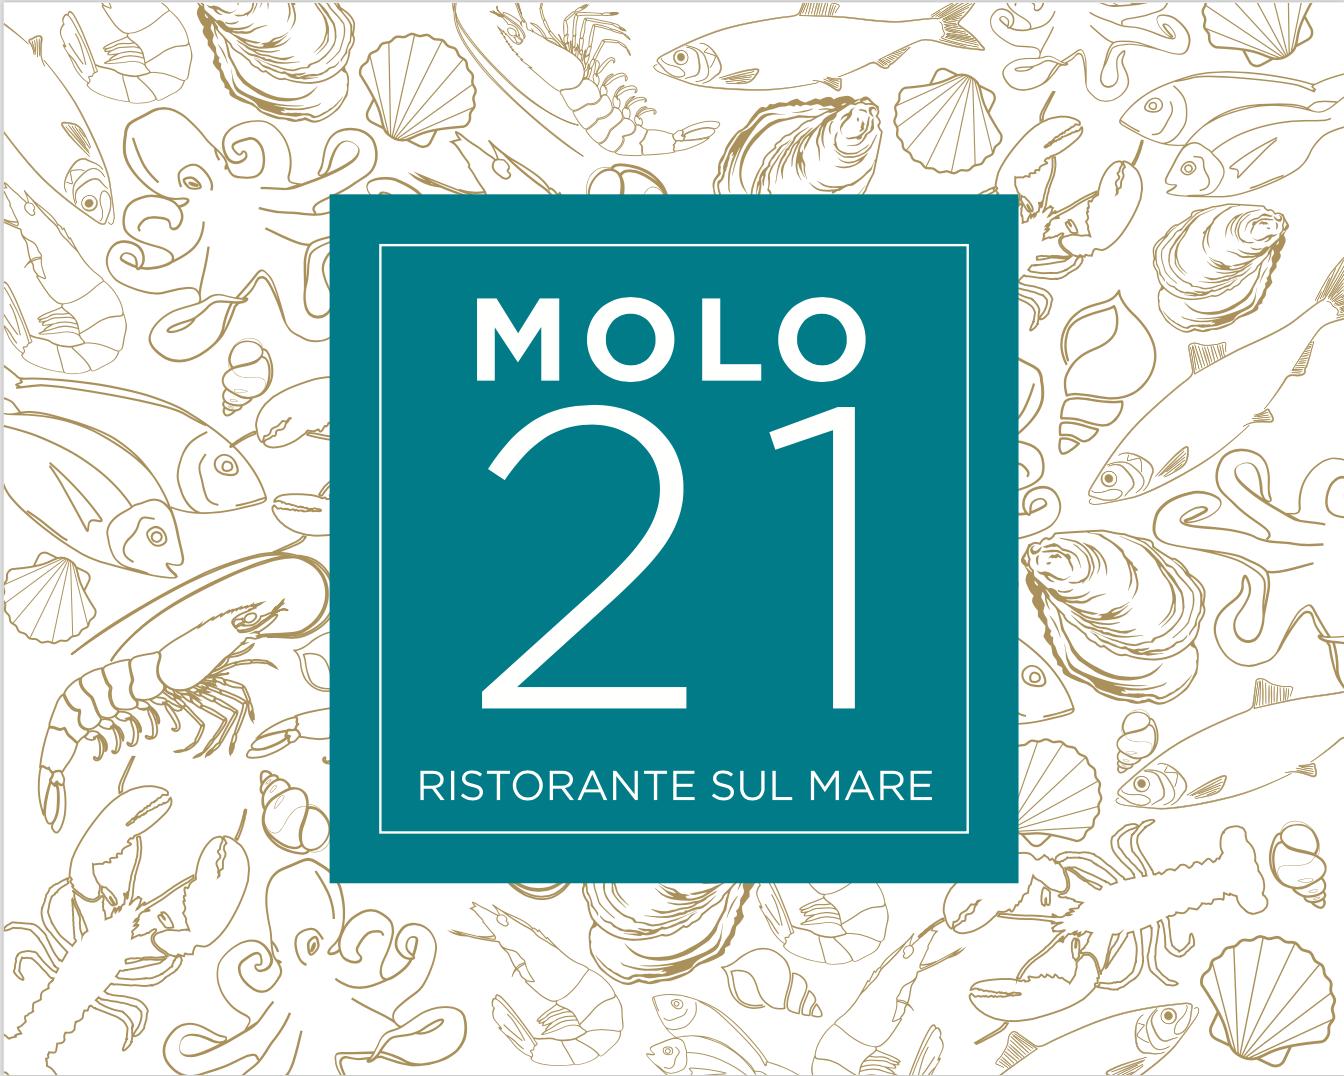 Molo21santamarinella